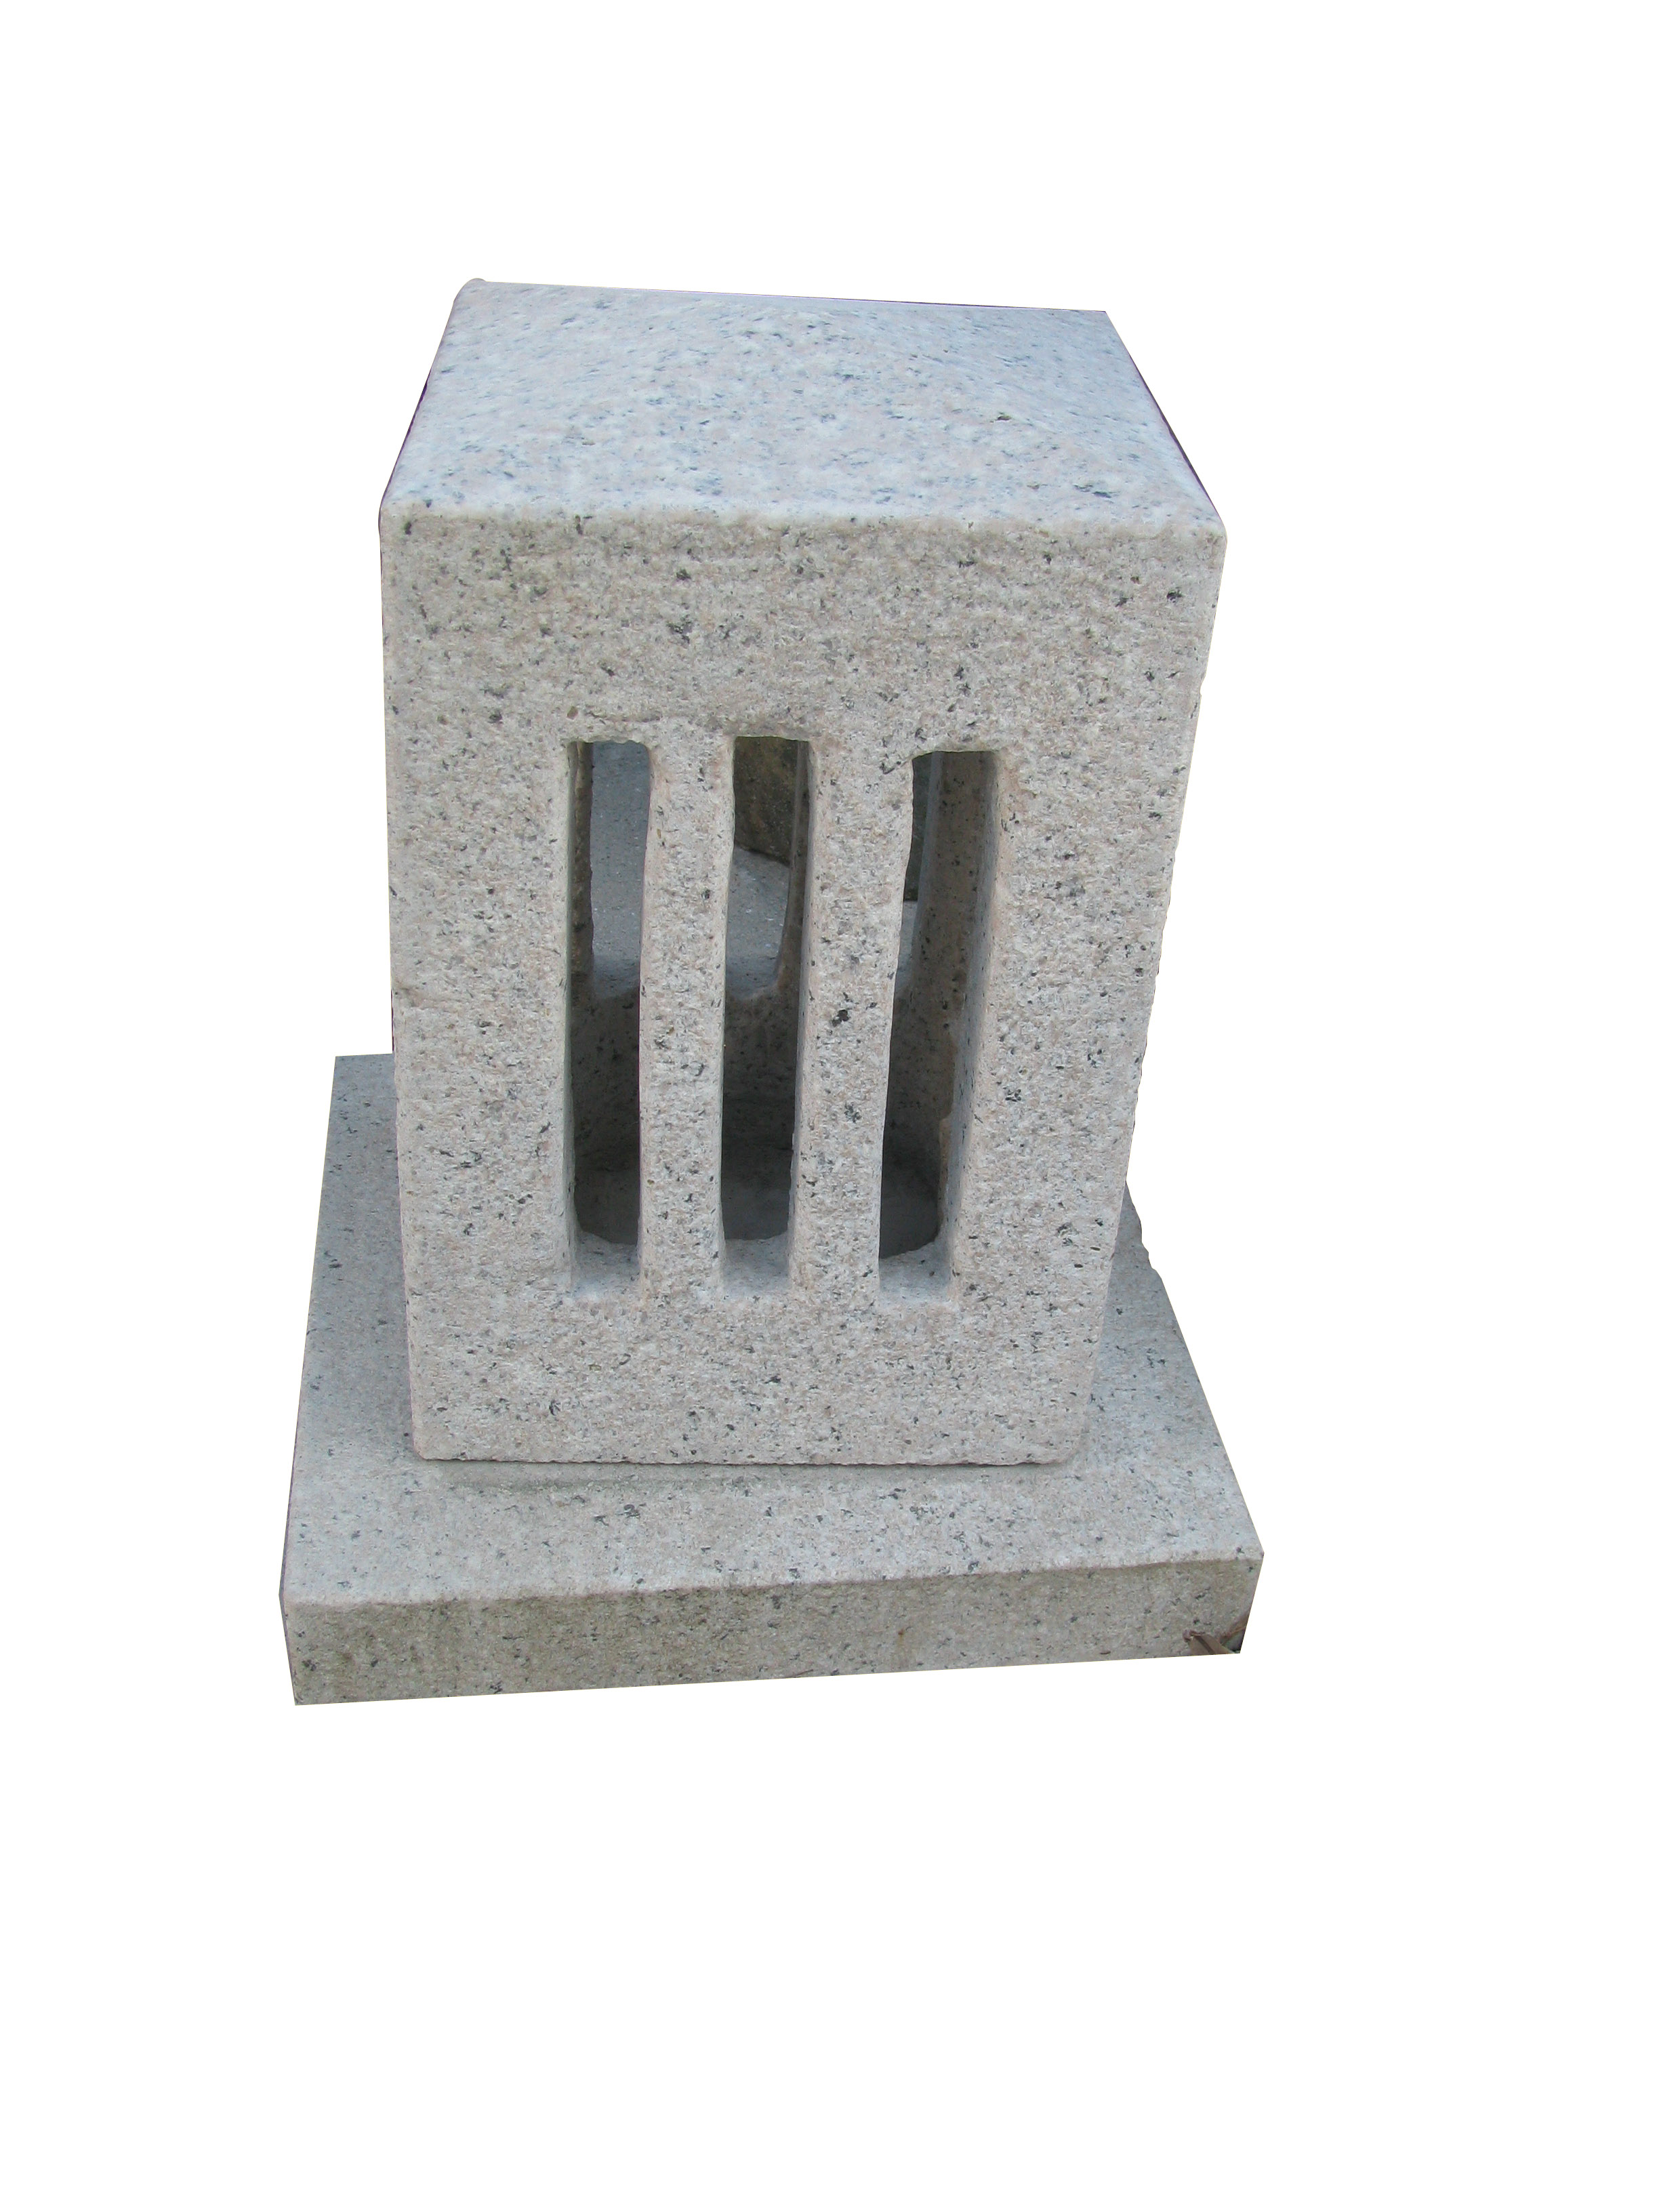 Quadrangle Lantern sculpture